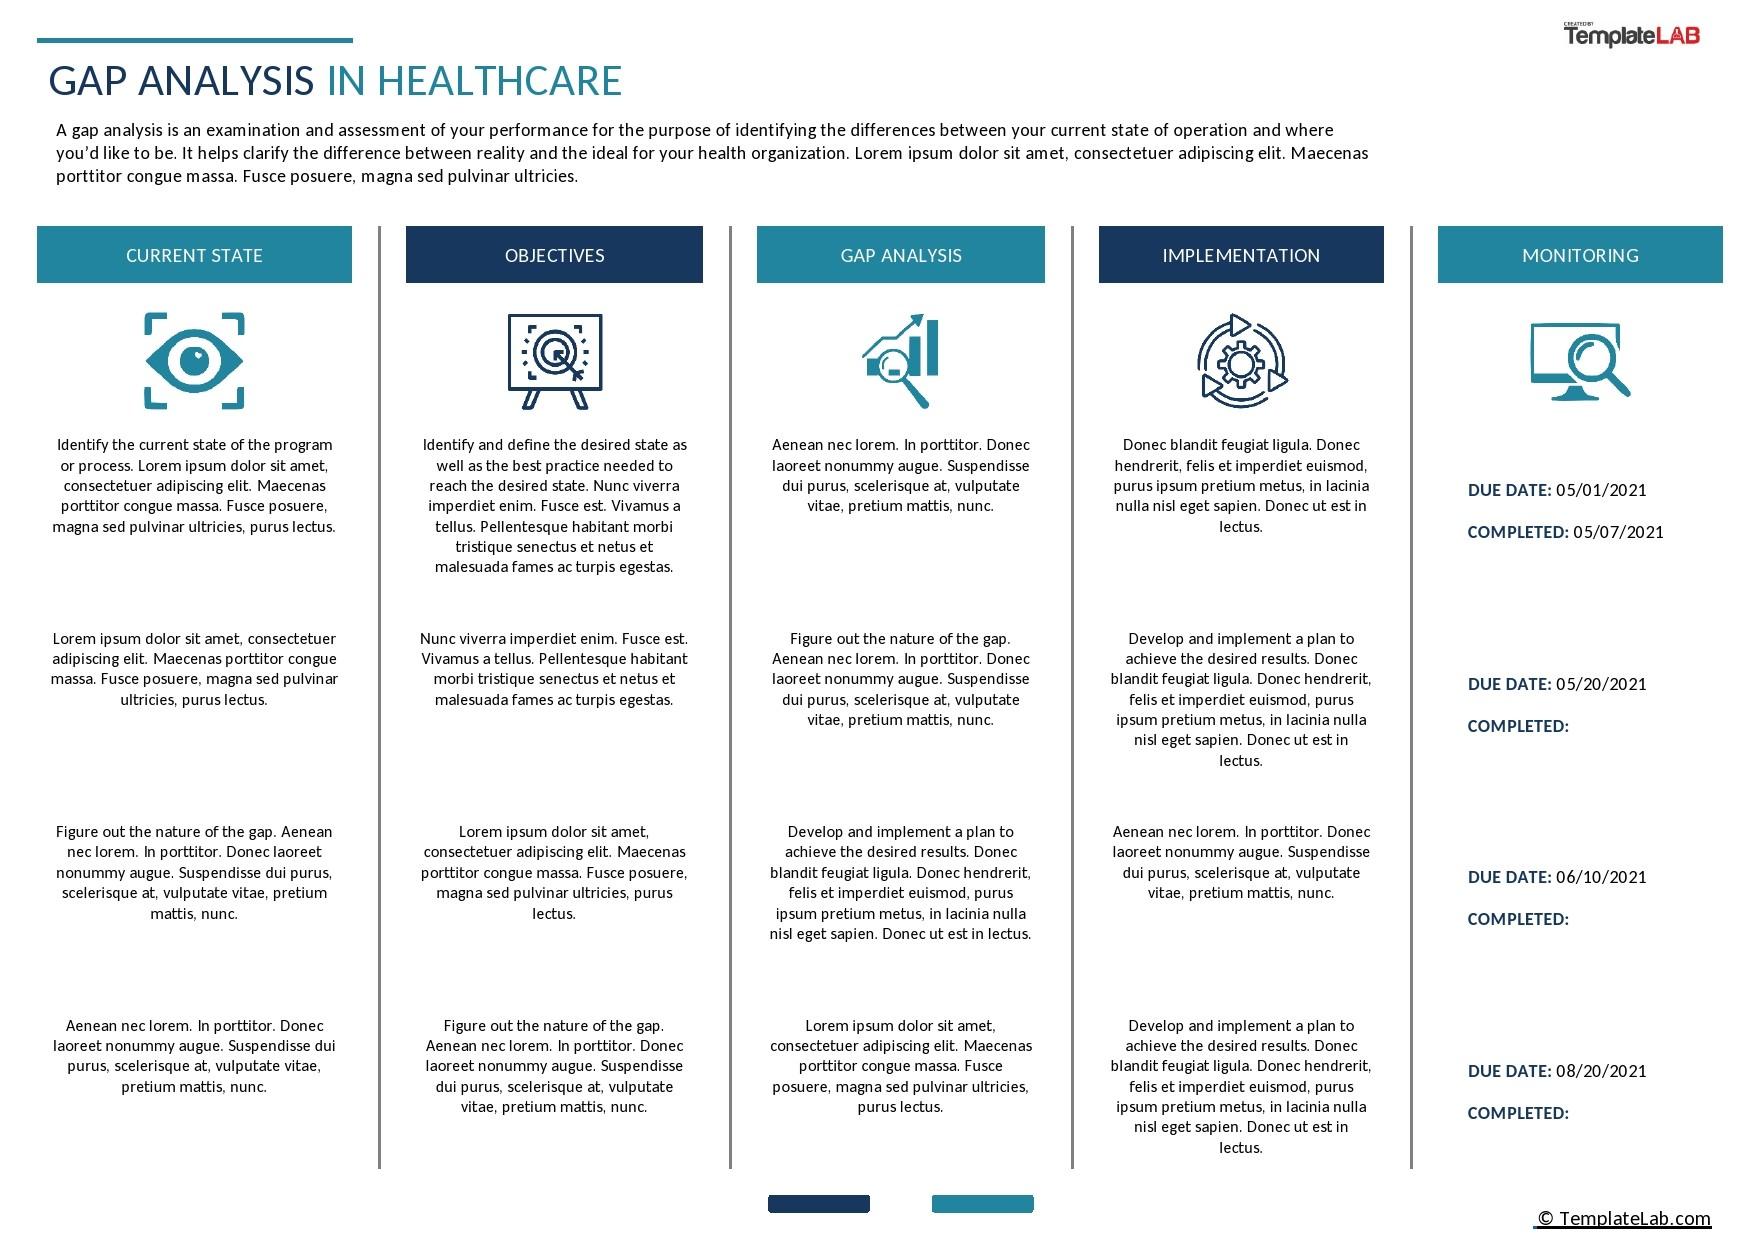 Free Gap Analysis in Healthcare Template - TemplateLab.com